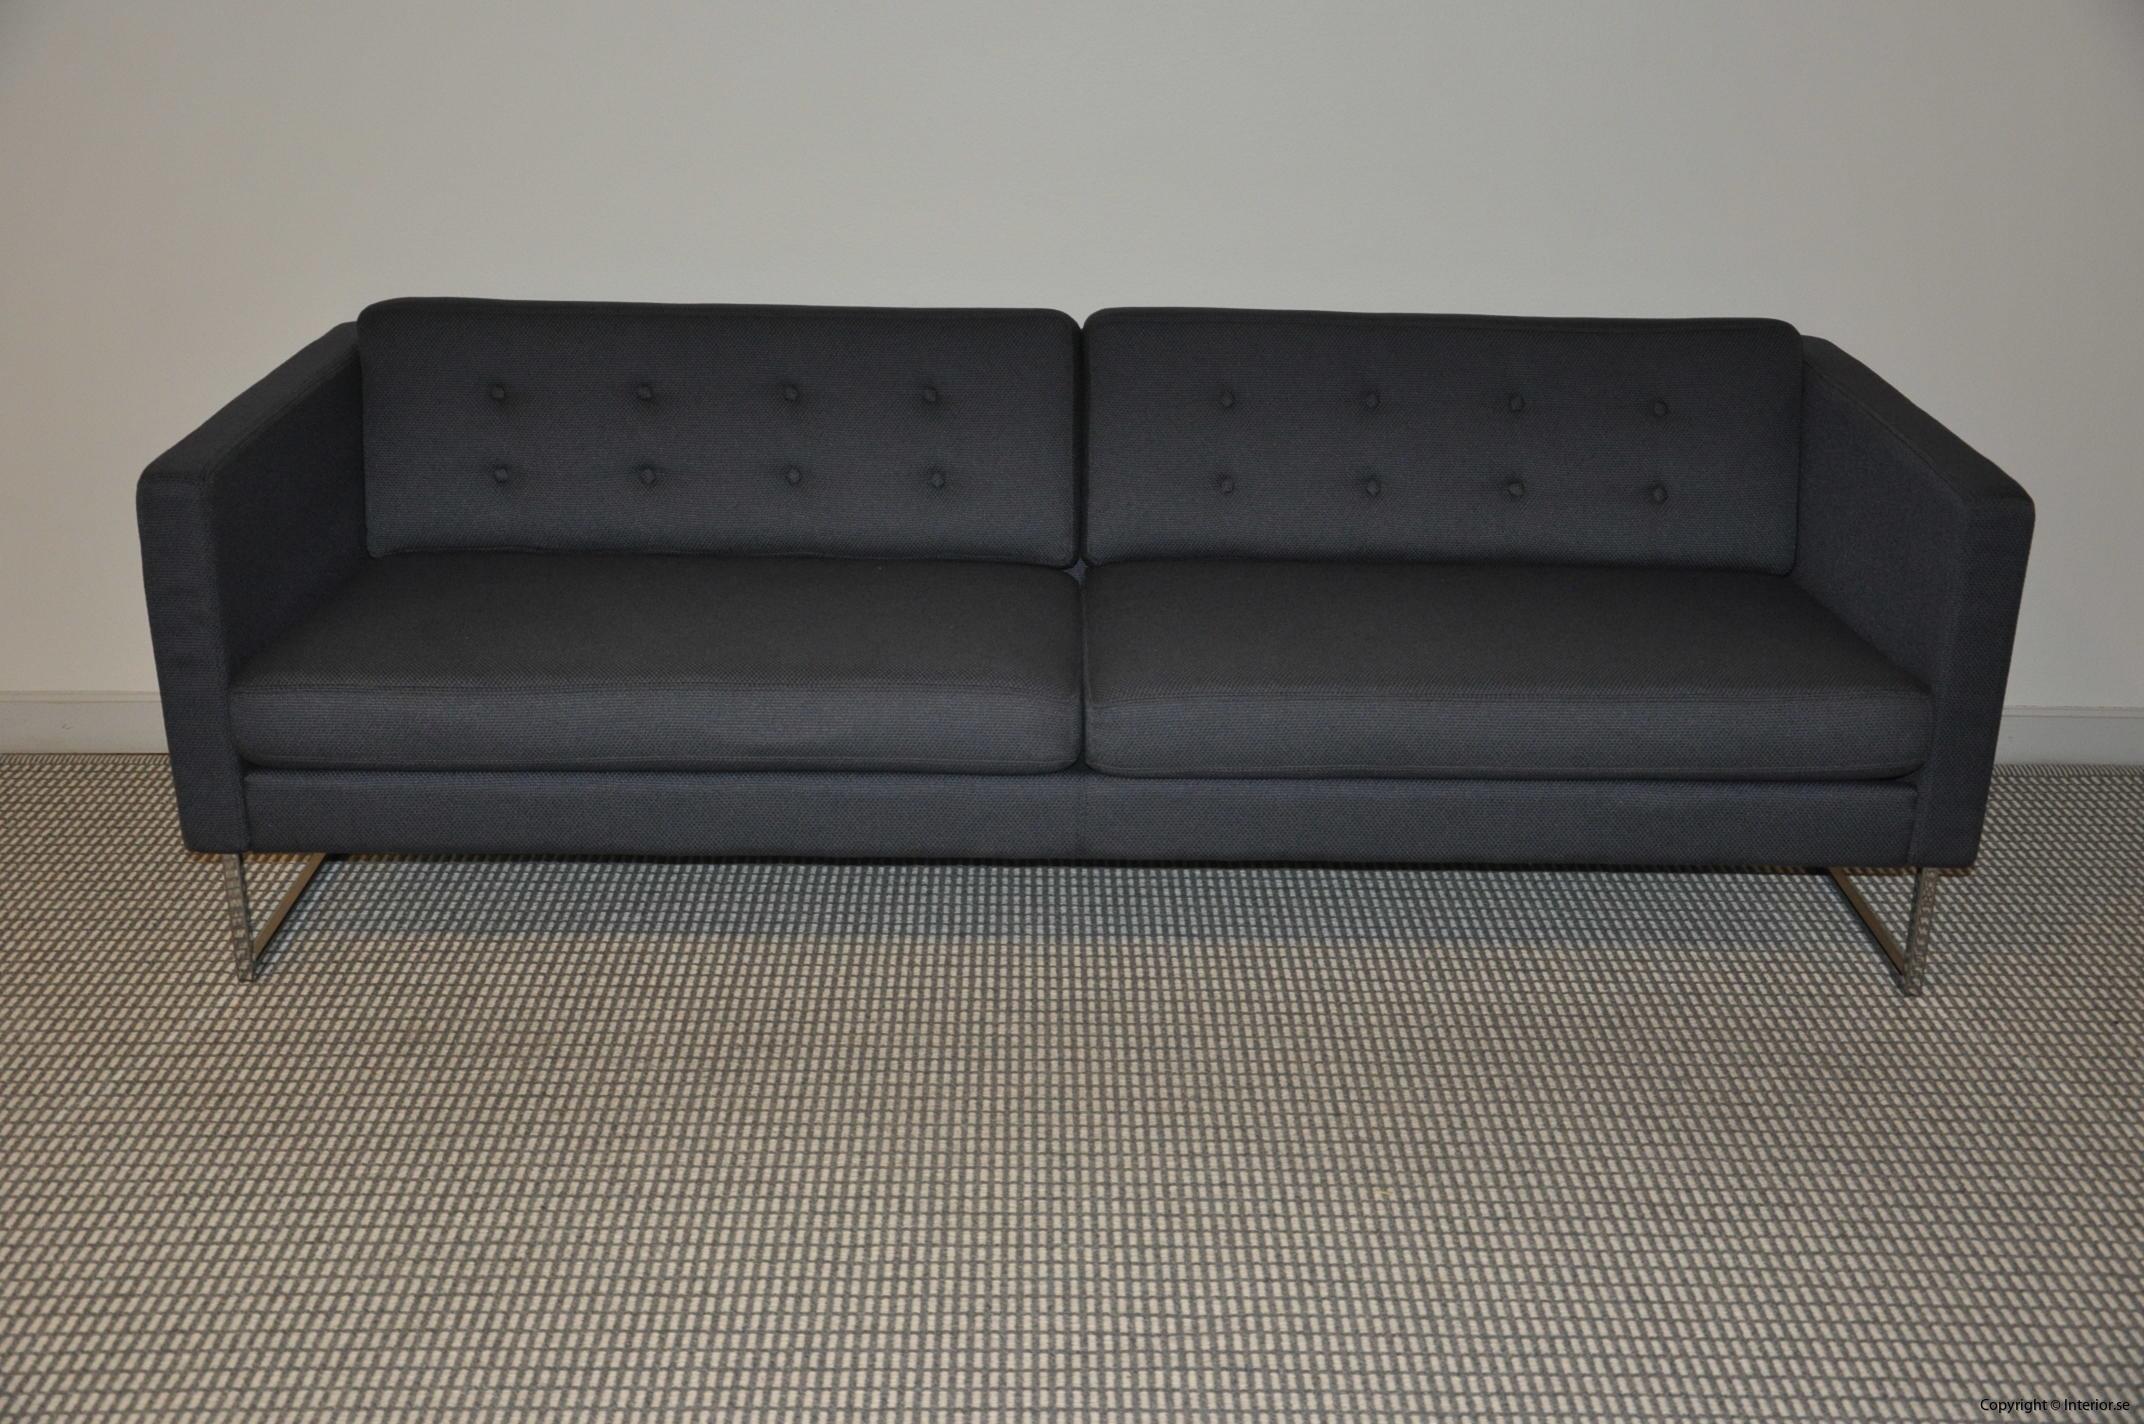 Begagnade designmöbler Swedese Madisson 3 sitssoffa (3)